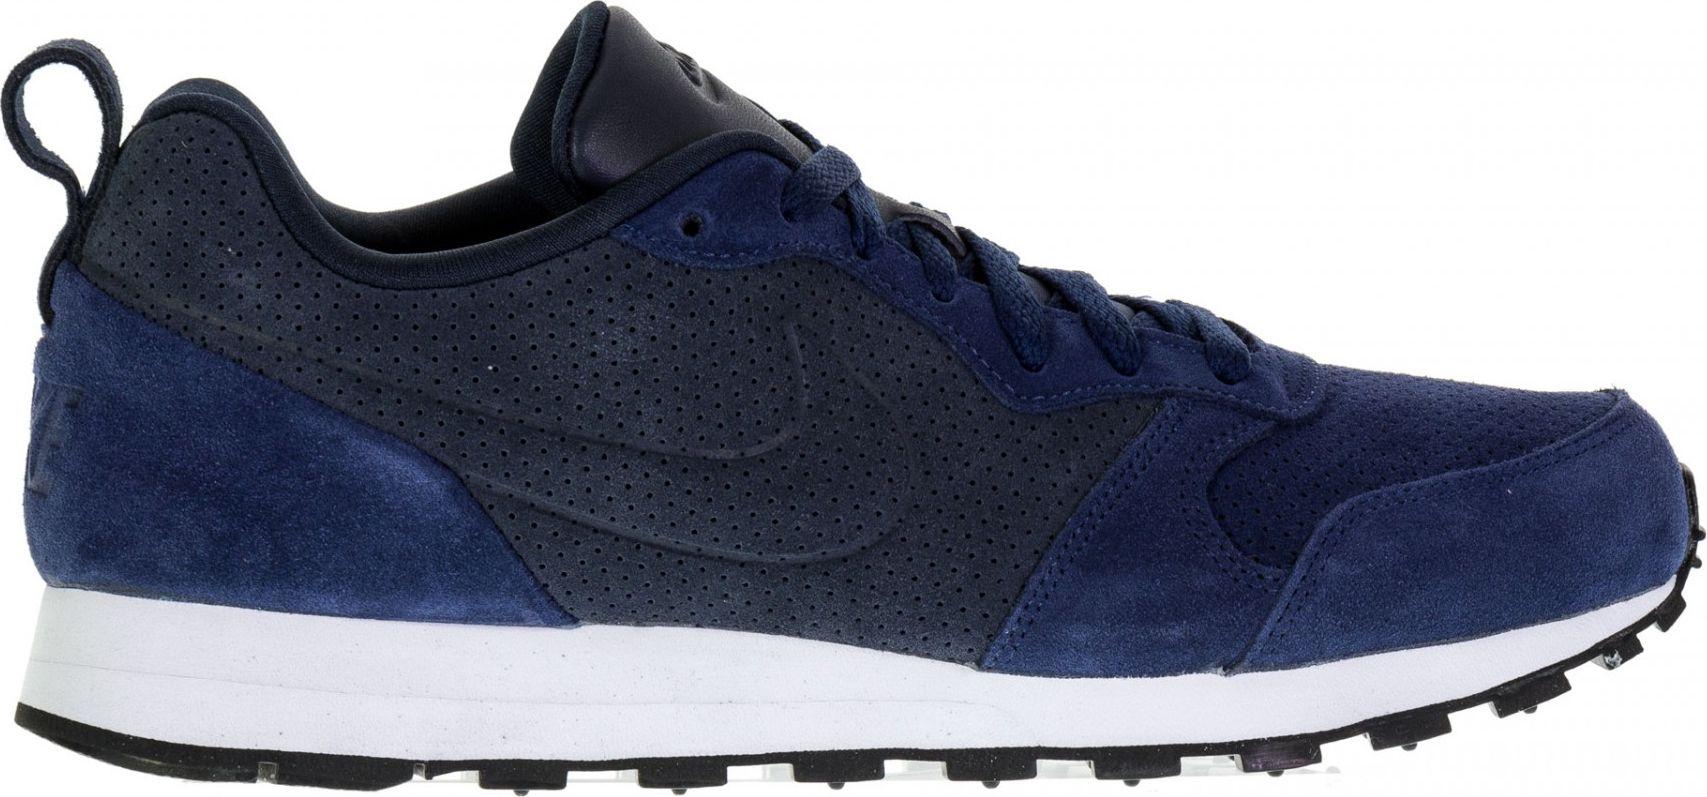 Nike MD Runner 2 Leather Premium